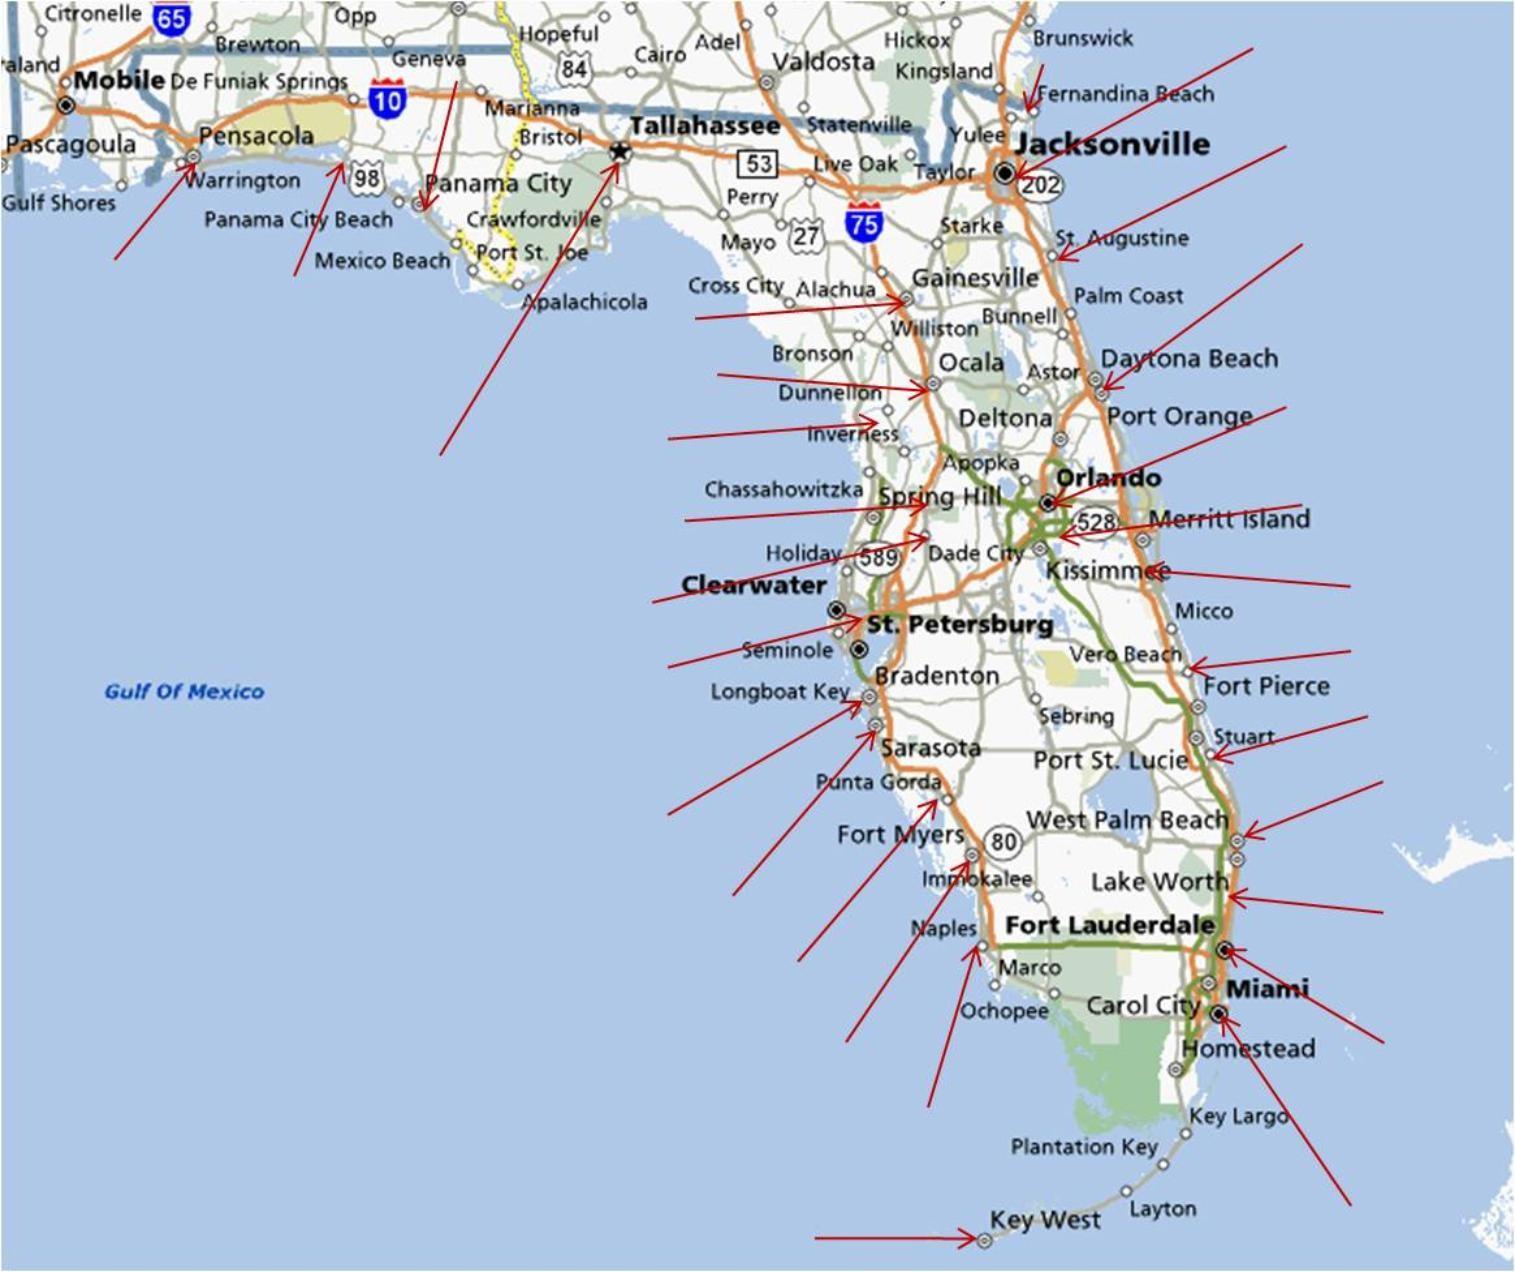 Mexico Beach Florida Map From Windsurfaddicts 9 - Judecelestin2010 - Orange Beach Florida Map